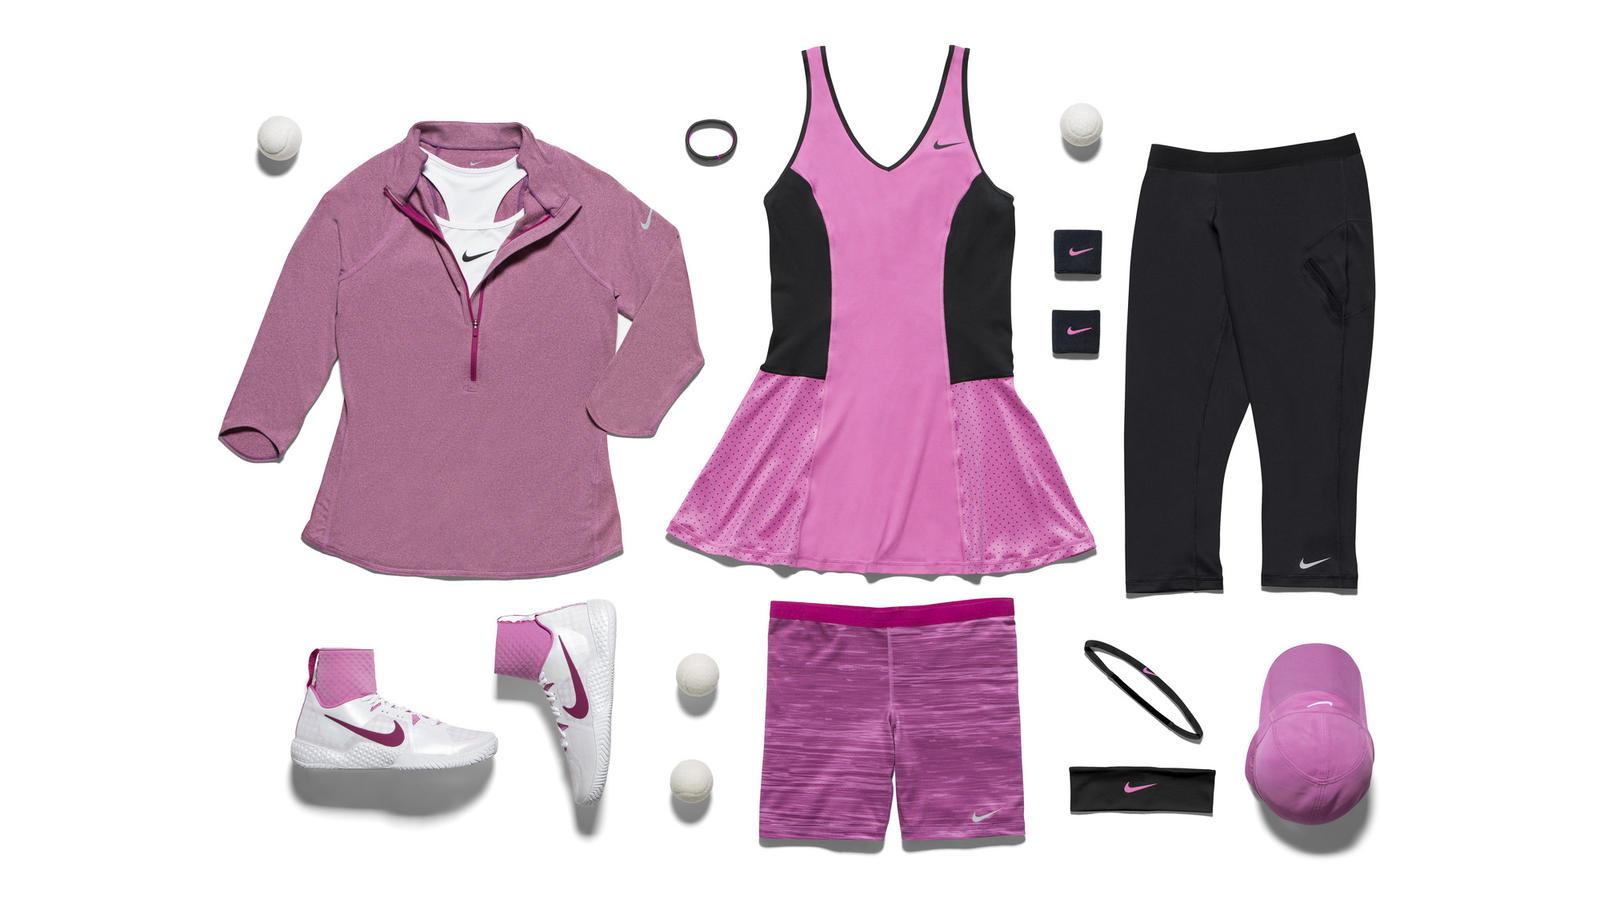 Nike Tennis Melbourne 2014